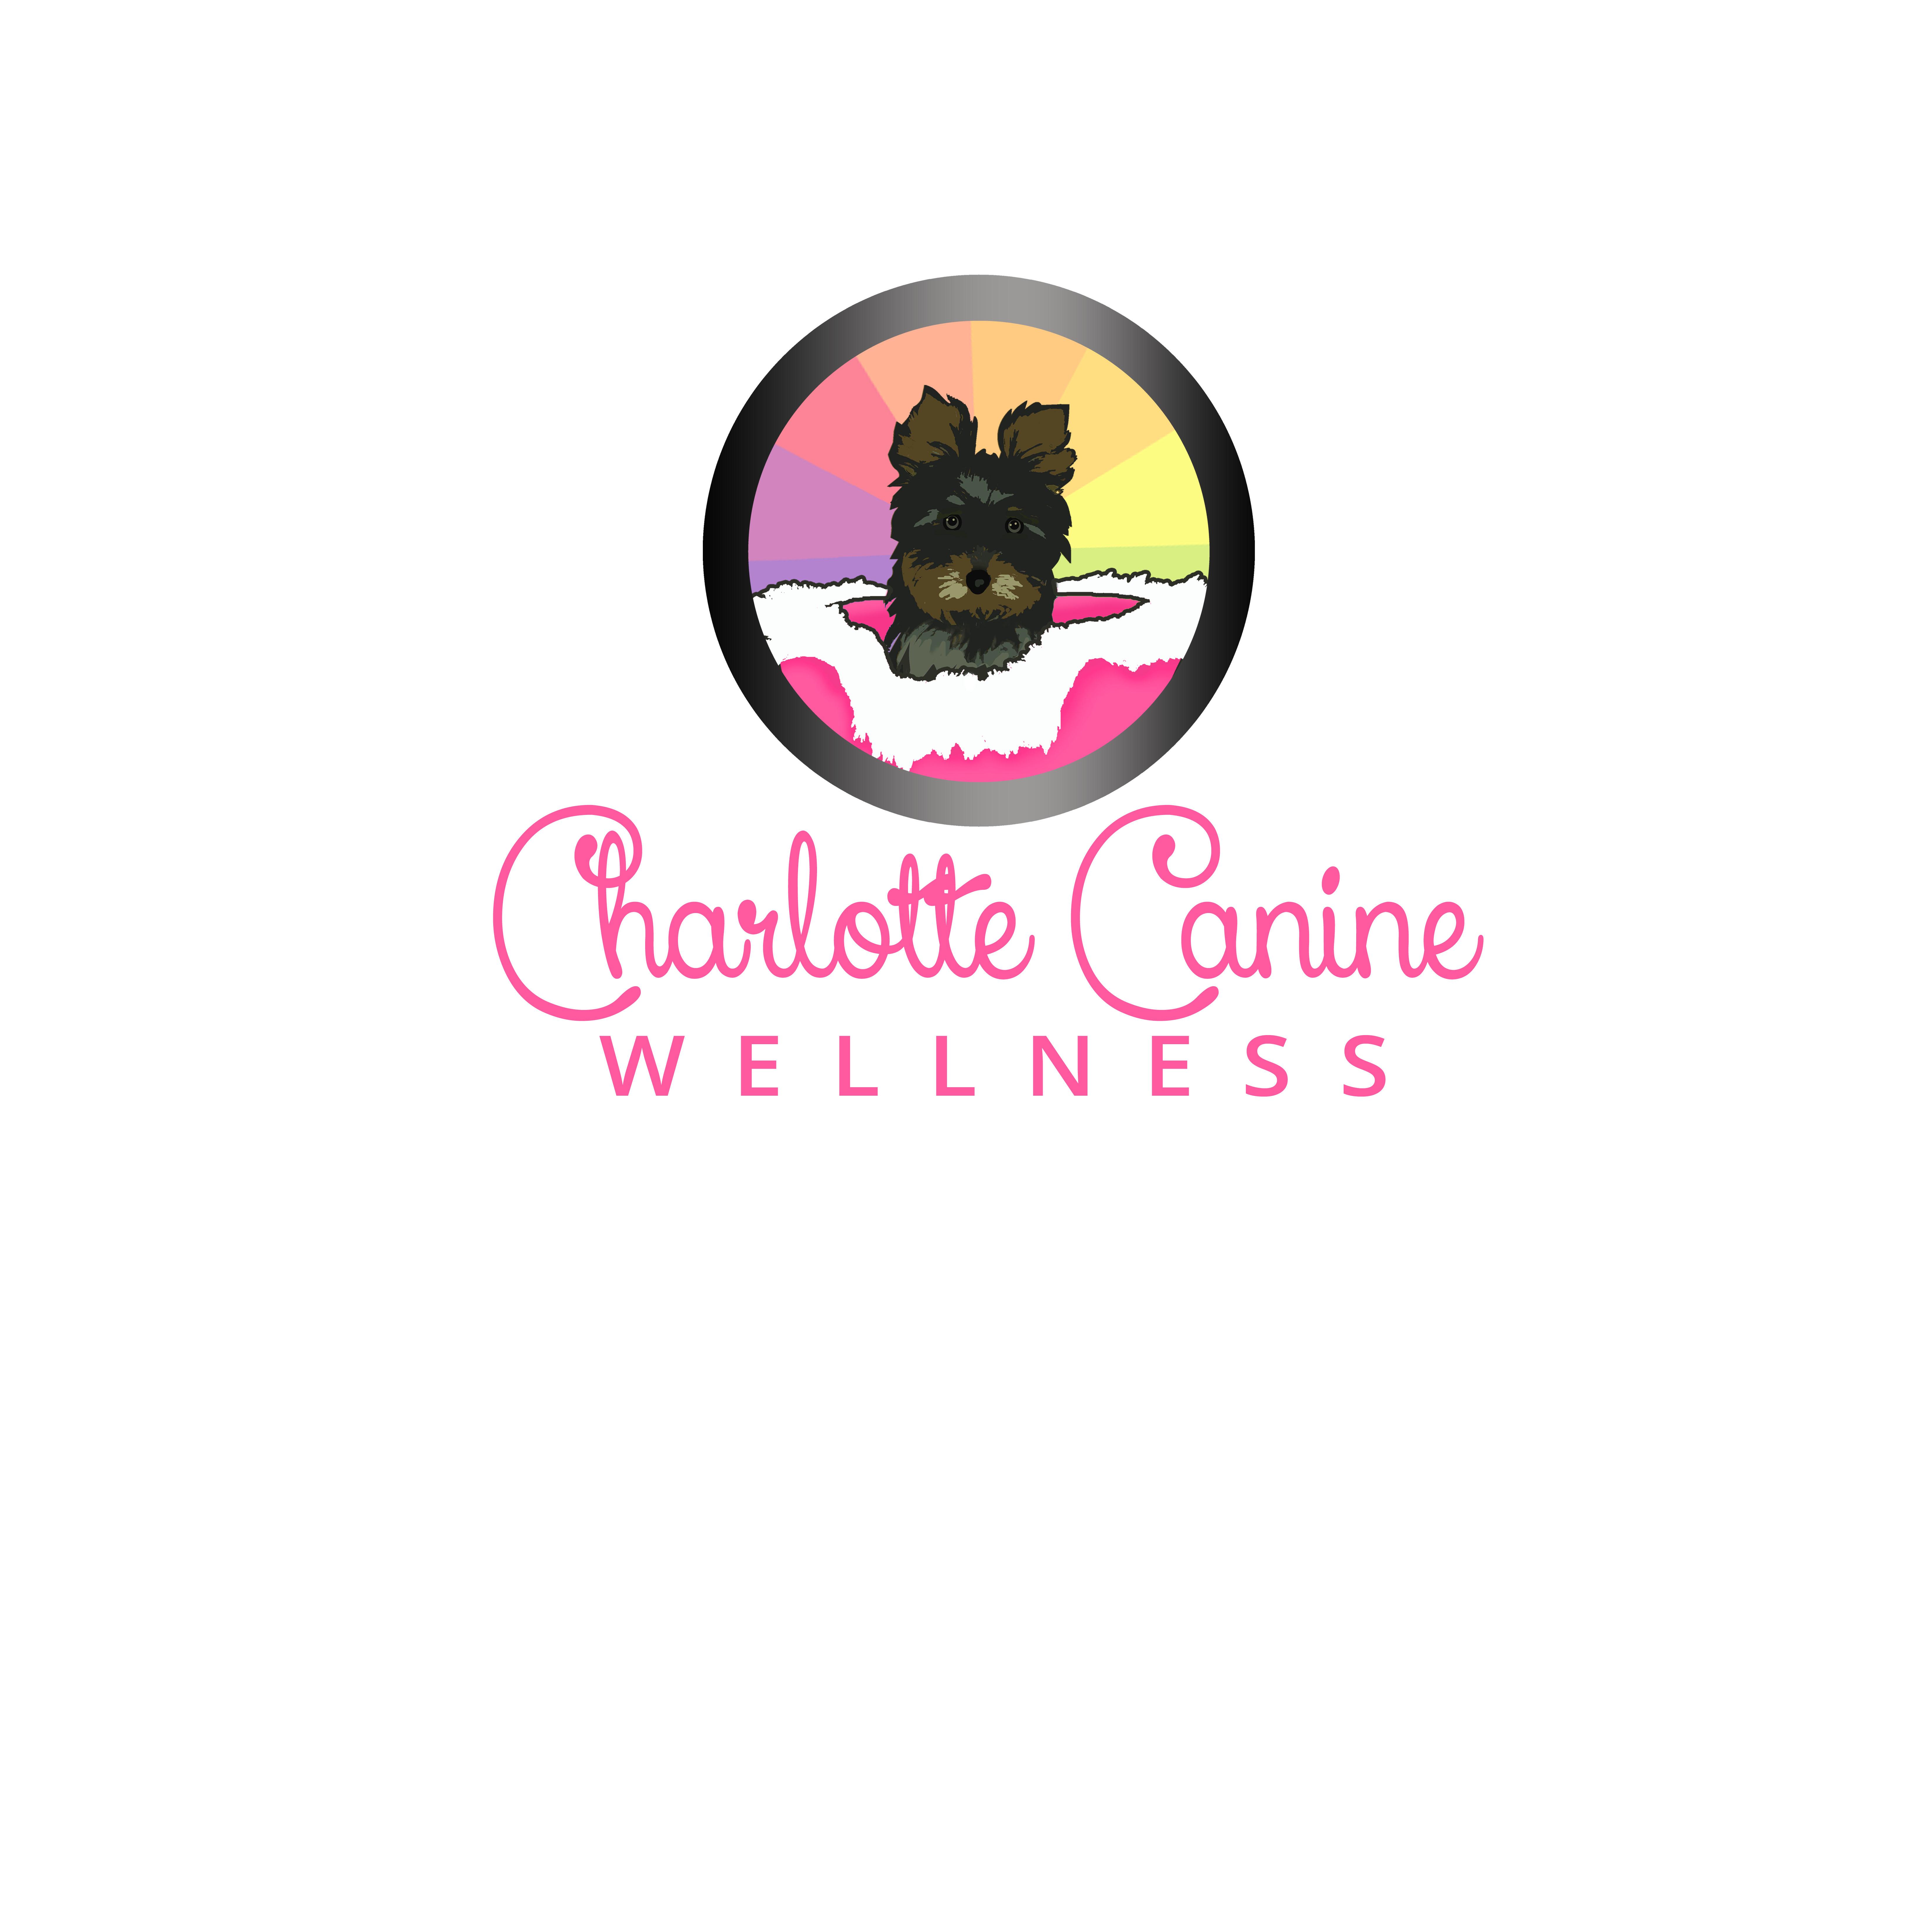 Logo Design by Allan Esclamado - Entry No. 90 in the Logo Design Contest New Logo Design for Charlotte Canine Wellness.